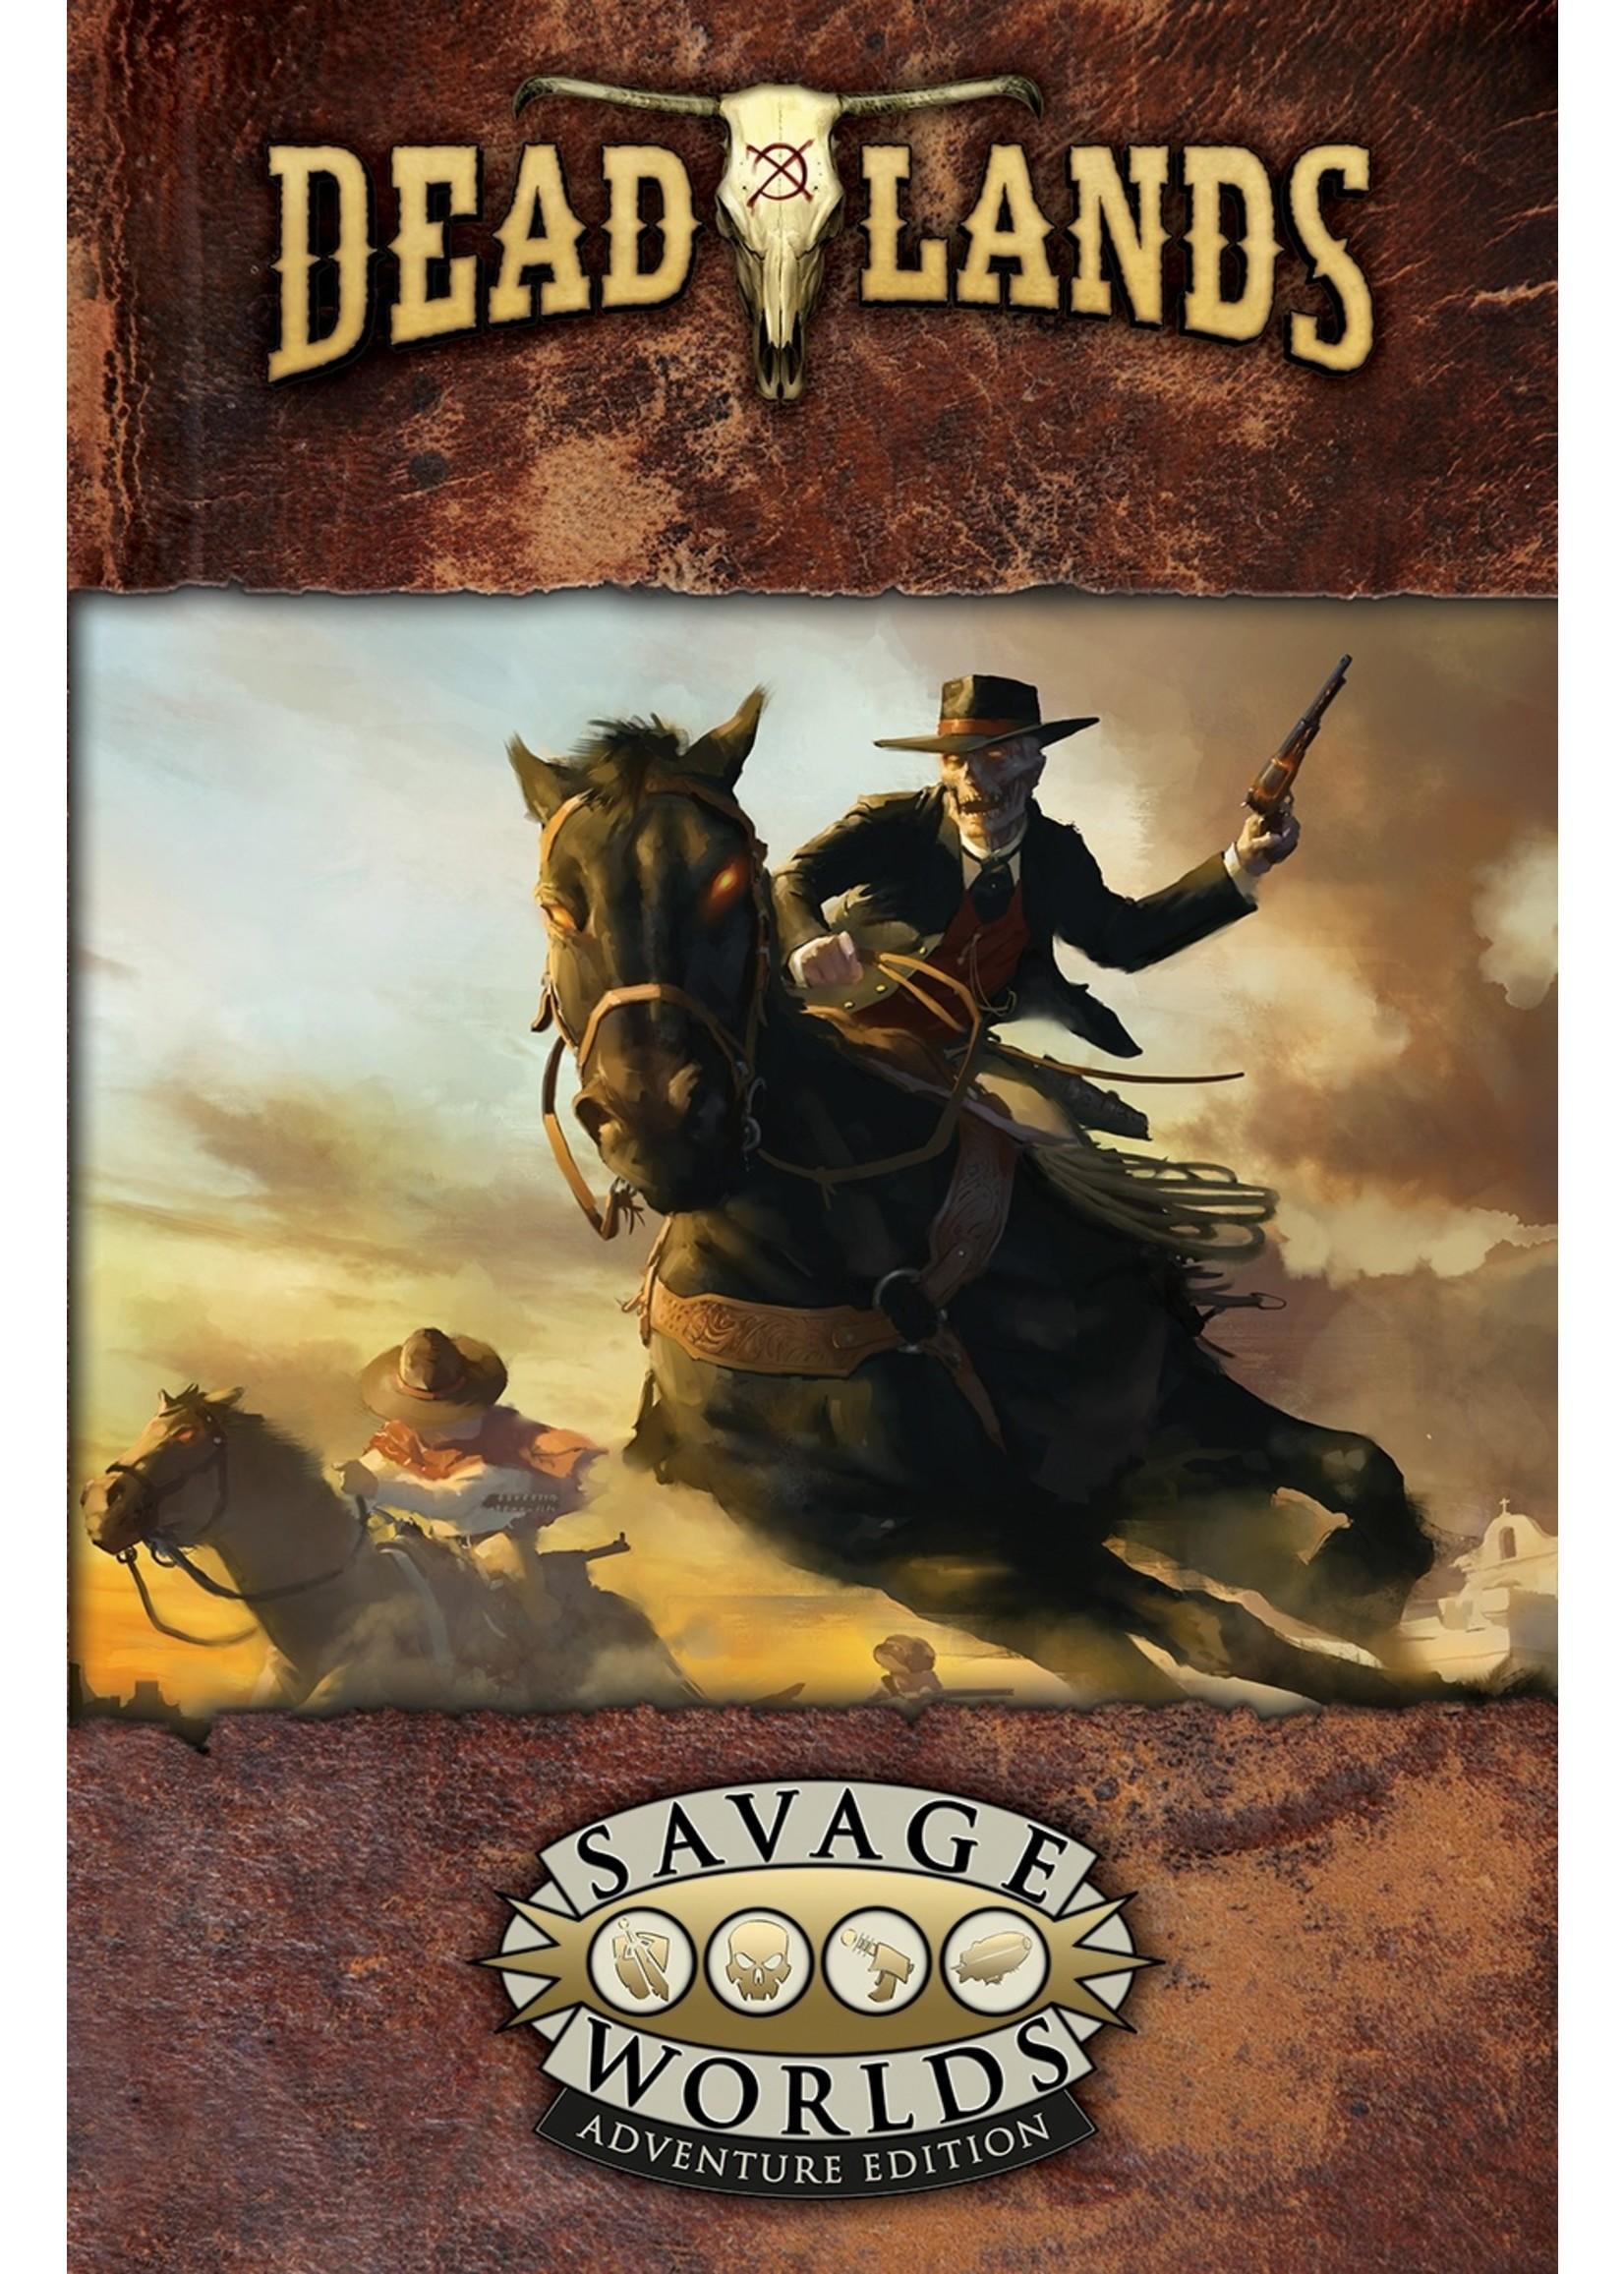 Savage Worlds RPG: Deadlands - The Weird West Core Rulebook